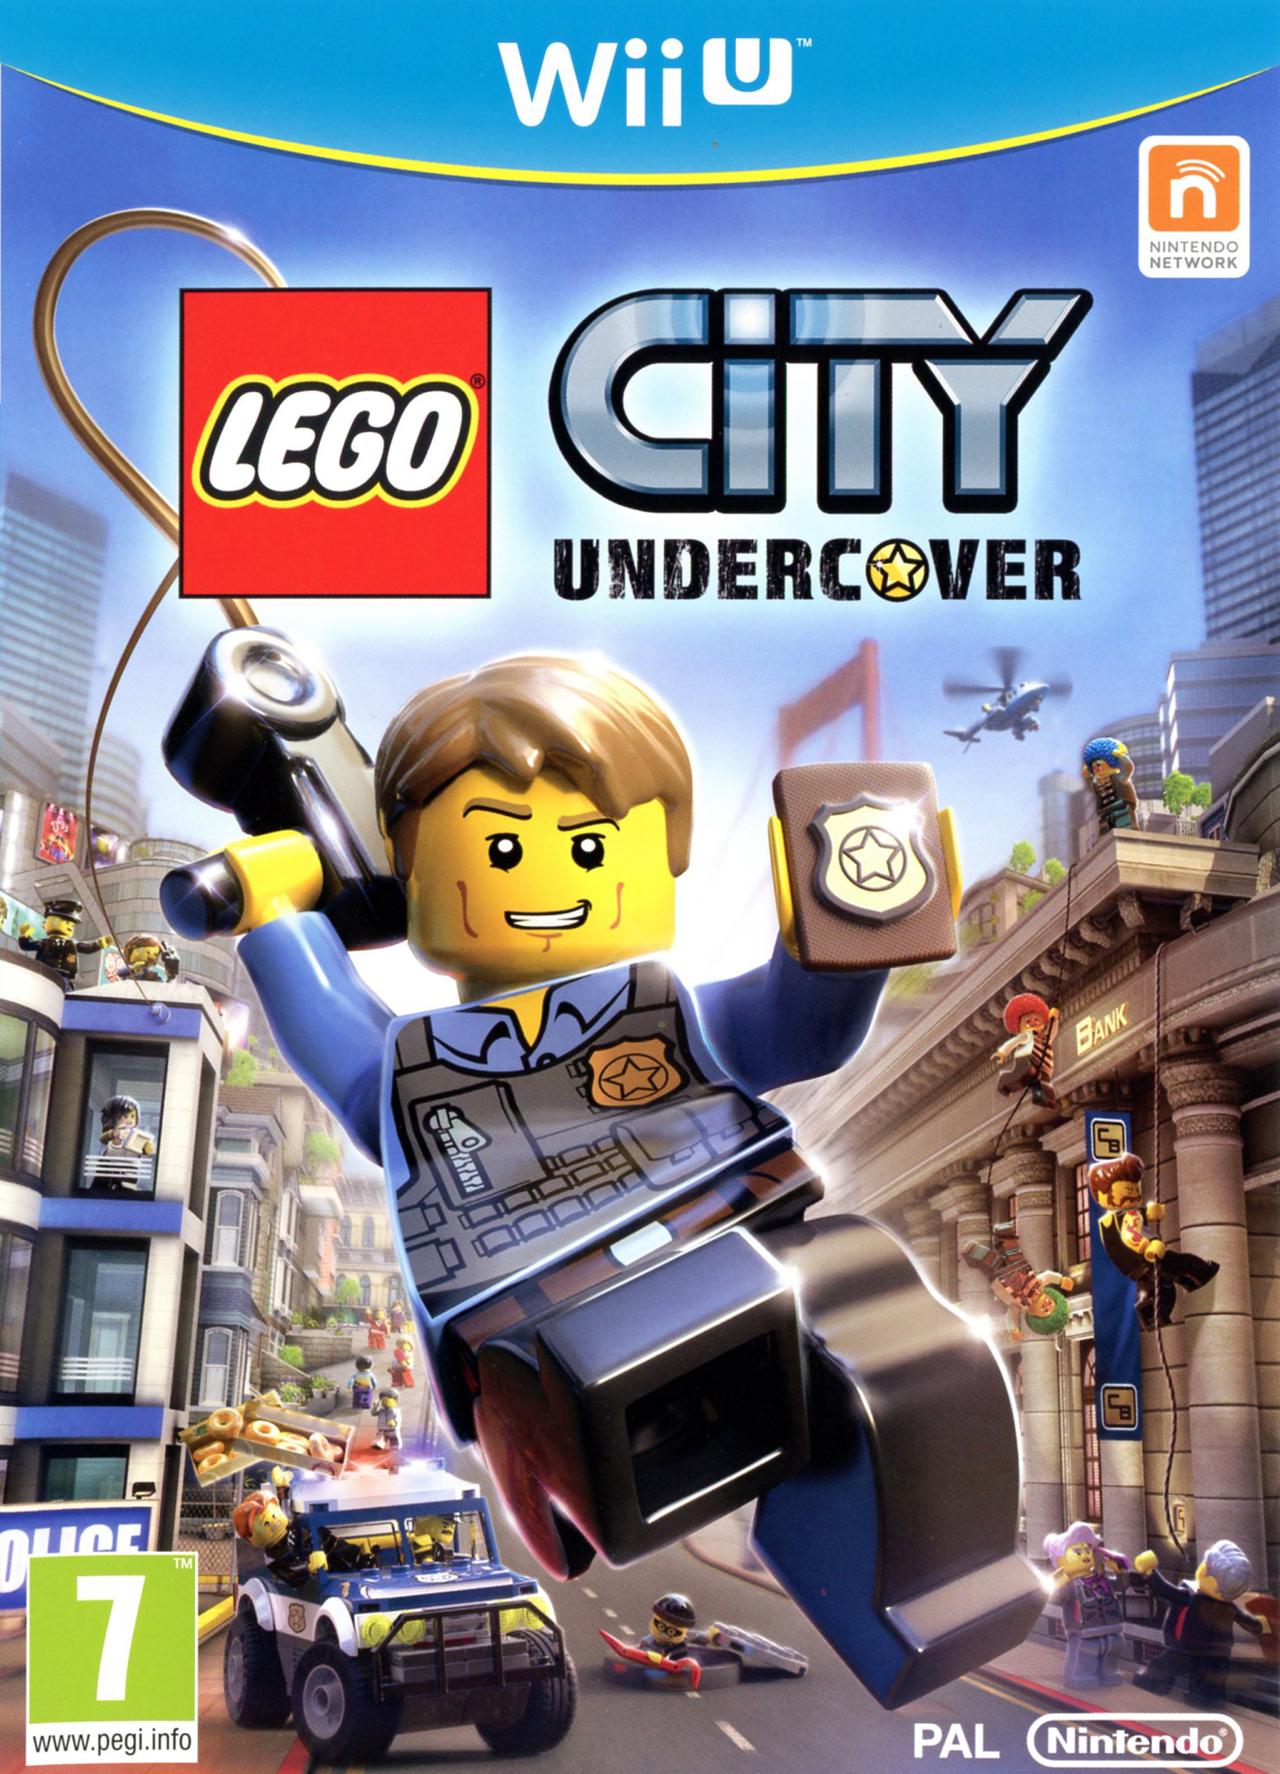 jeux vid o lego city undercover wii u d 39 occasion. Black Bedroom Furniture Sets. Home Design Ideas